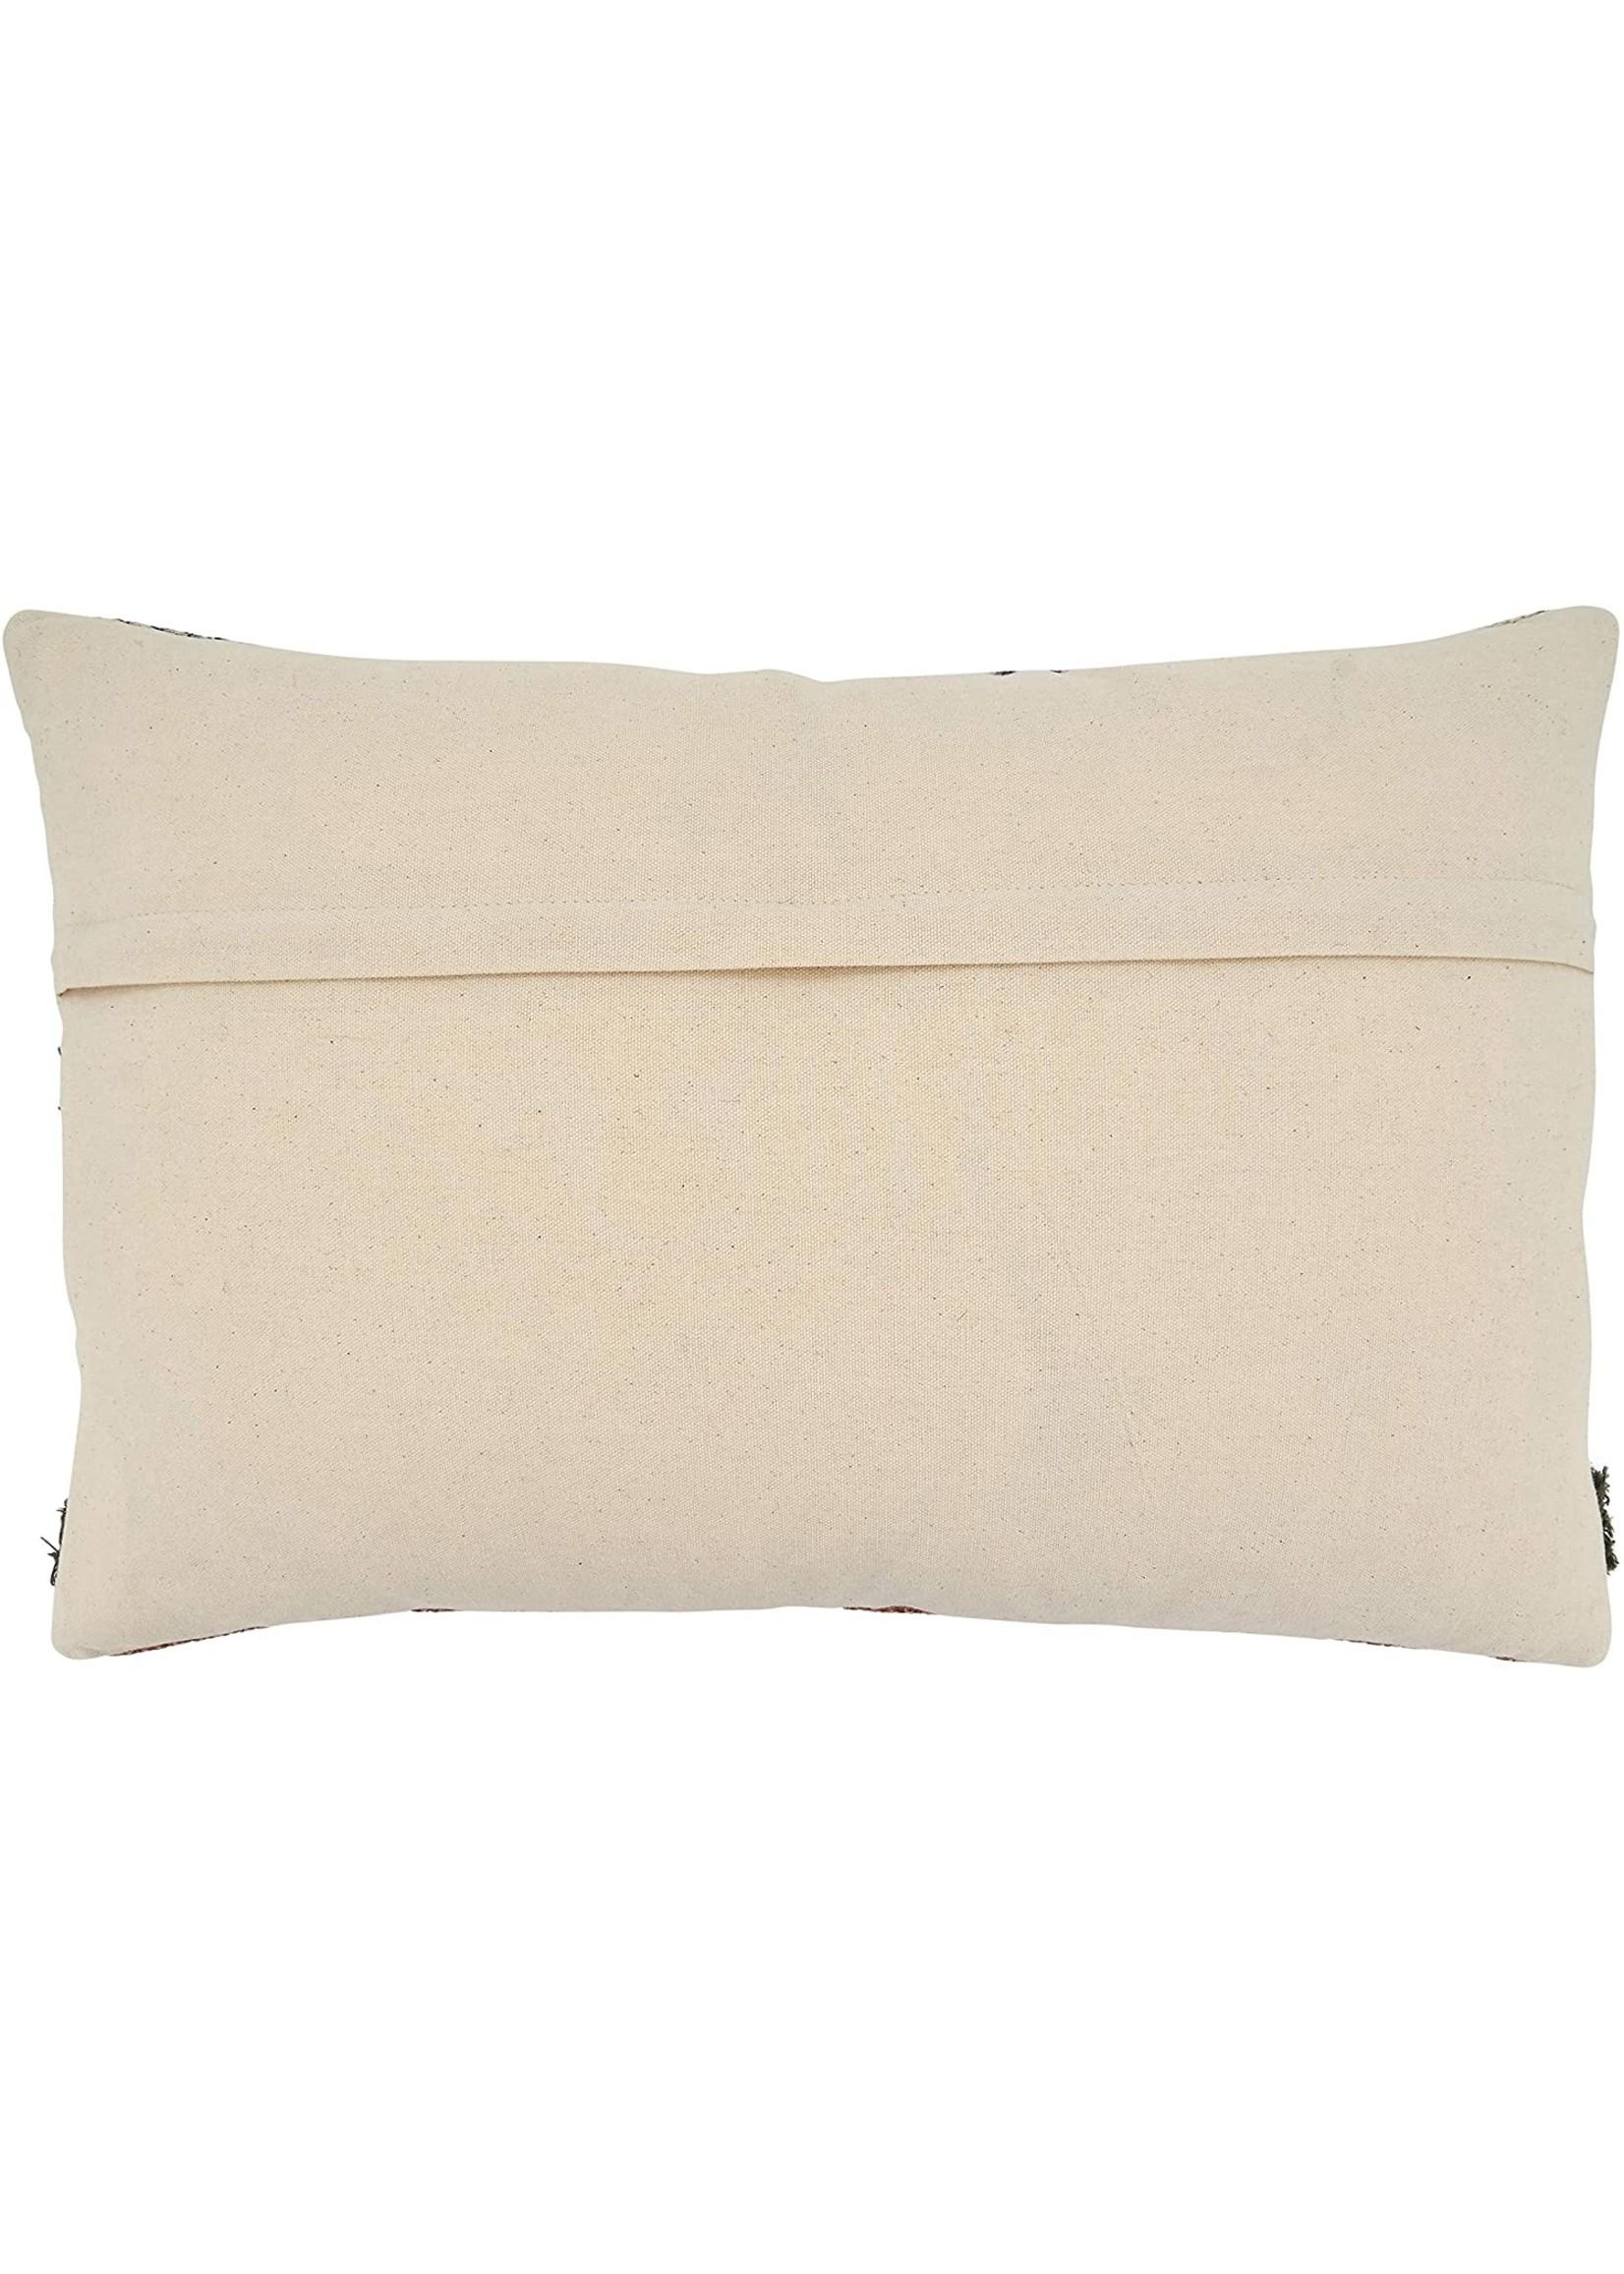 Saro Printed & Emb Pillow - Multi